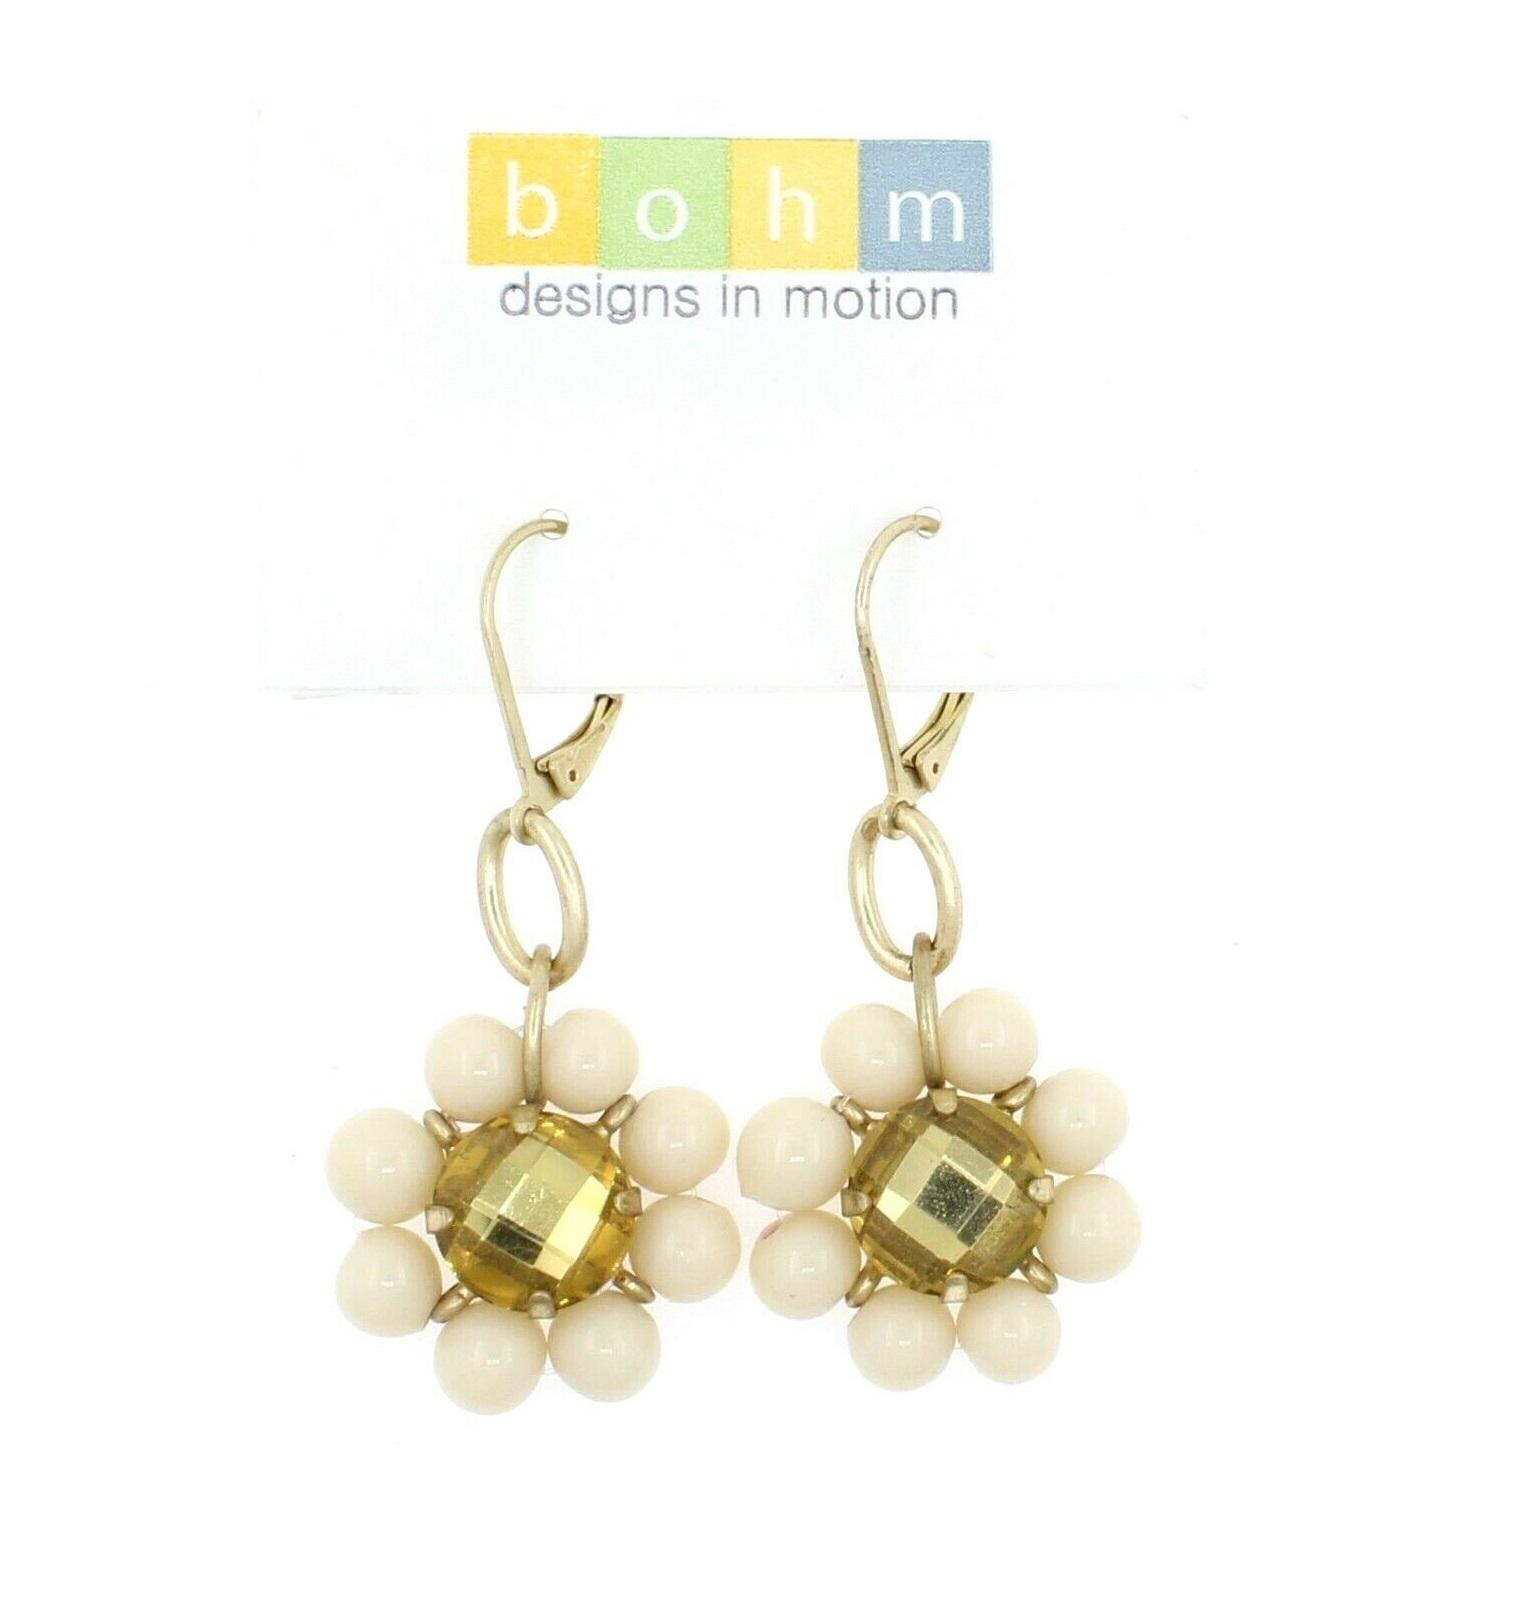 Bohm Floral Folklore - Glass Flower Earrings - Gold Plate/Cream BNWT